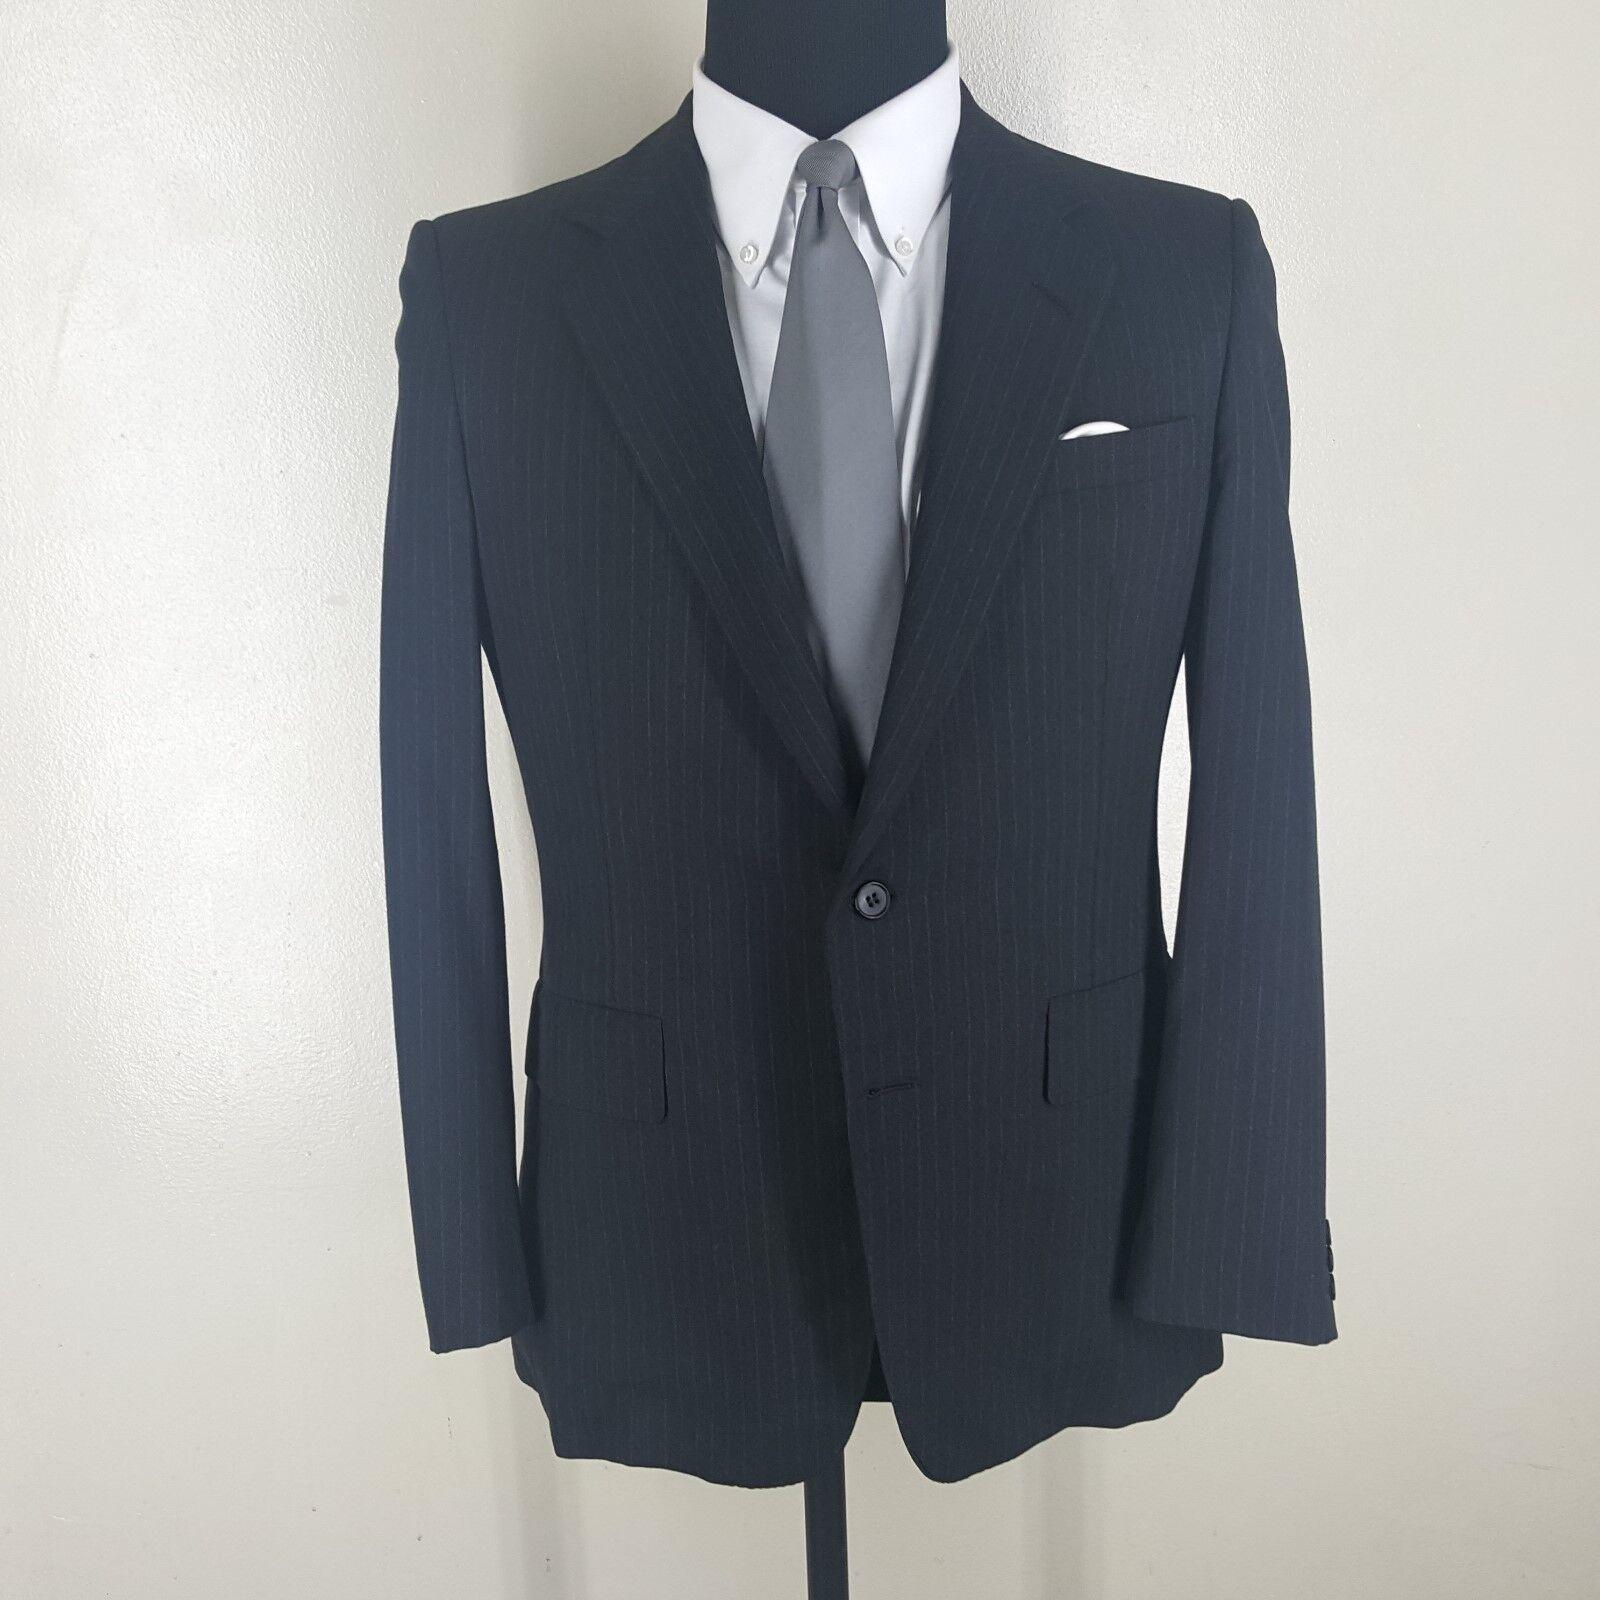 CHESTER BARRIE Vintage Wool Sport Coat  Made In U.K. 2 Btn Side Vents  40 Short